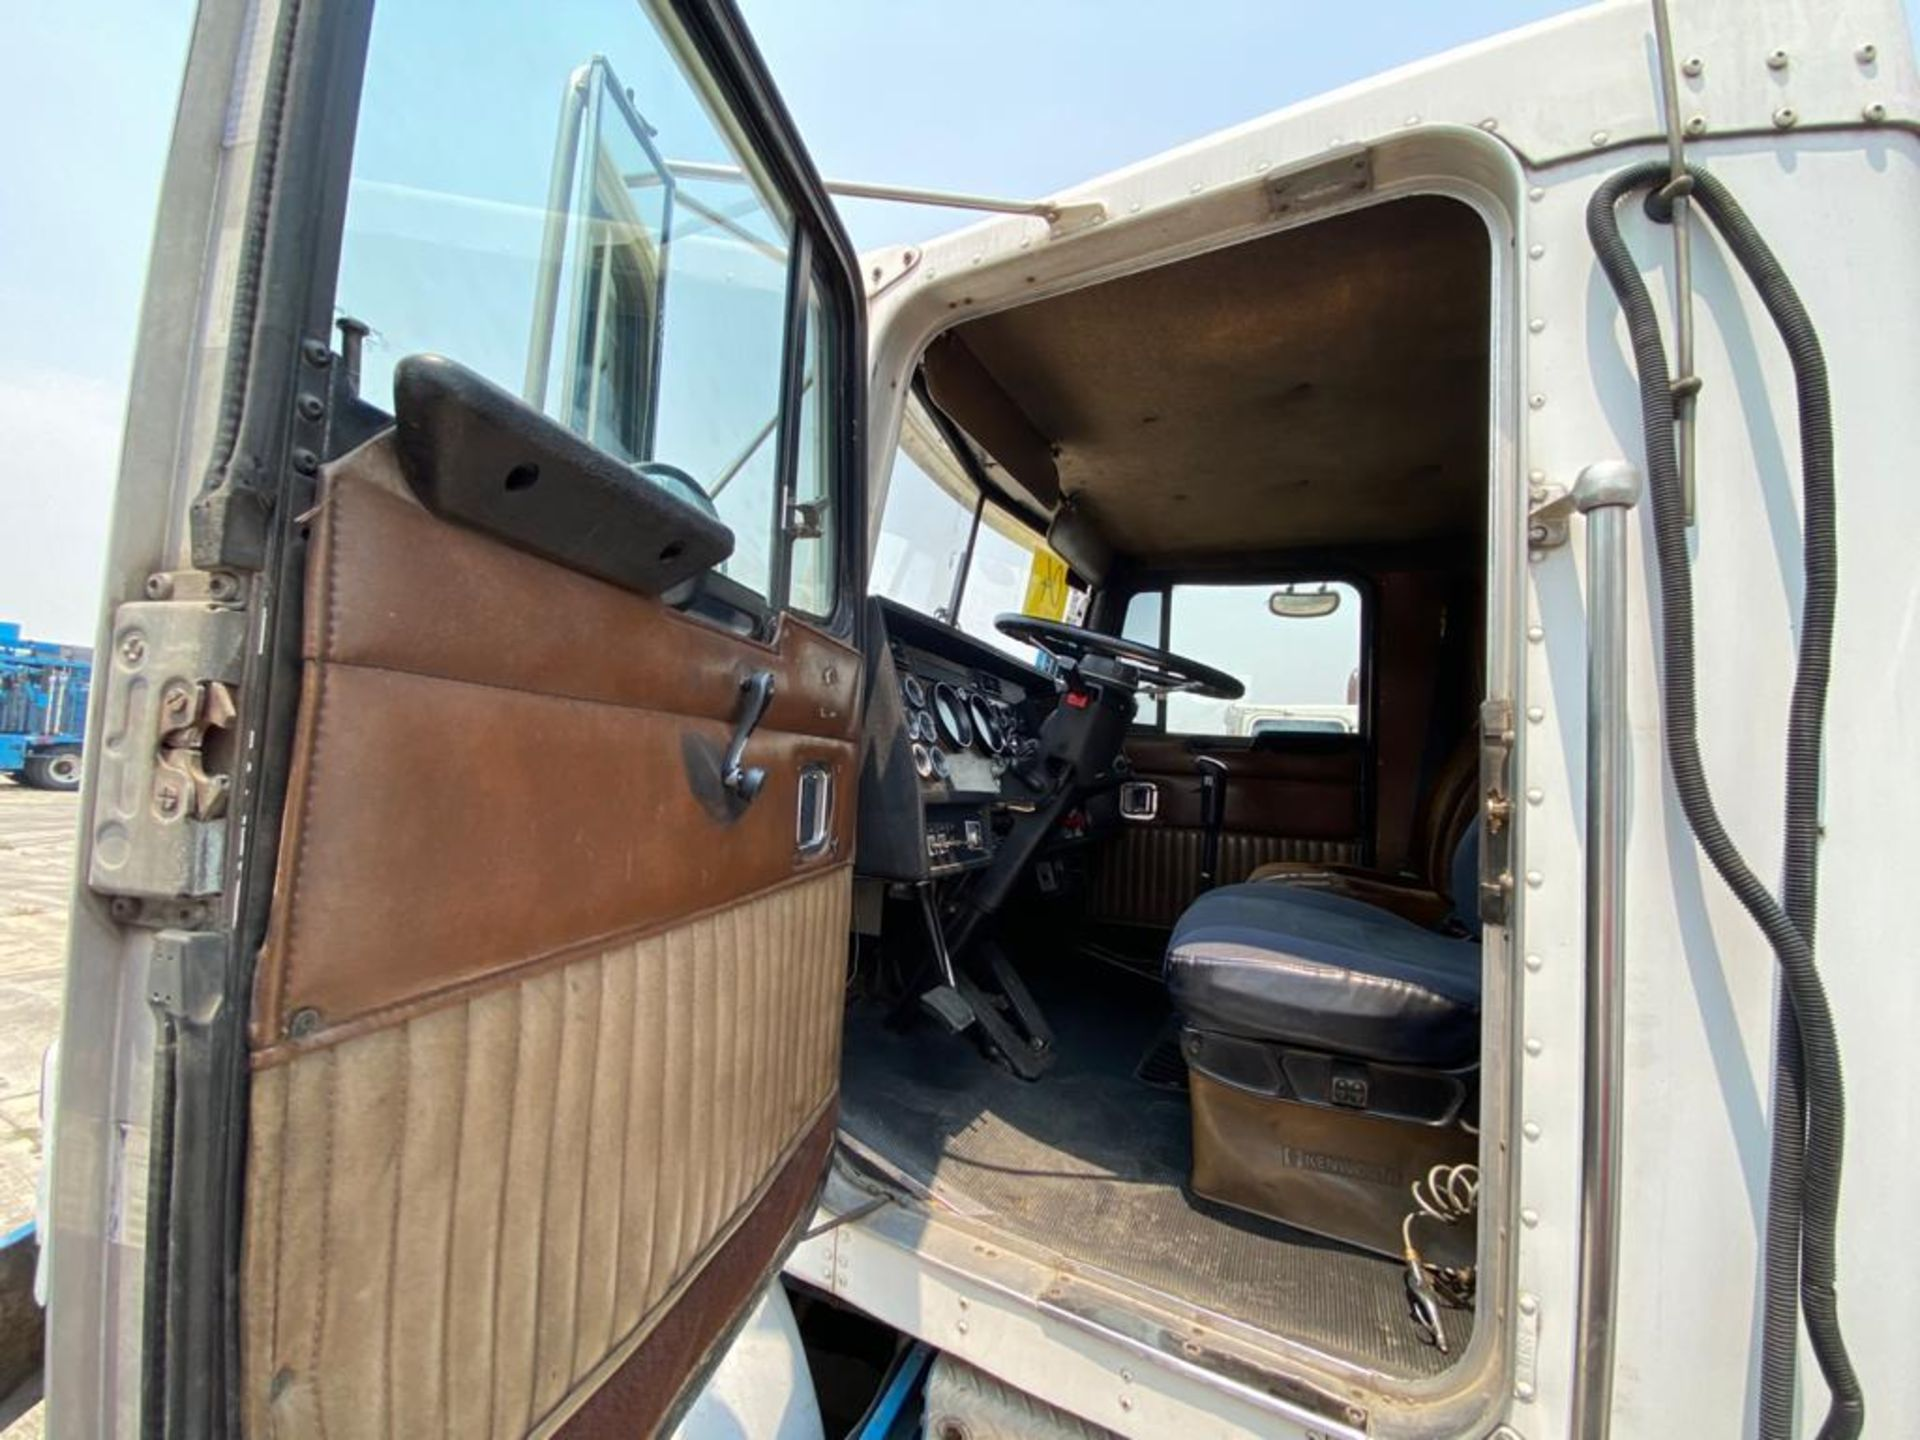 1999 Kenworth Sleeper truck tractor, standard transmission of 18 speeds - Image 28 of 70